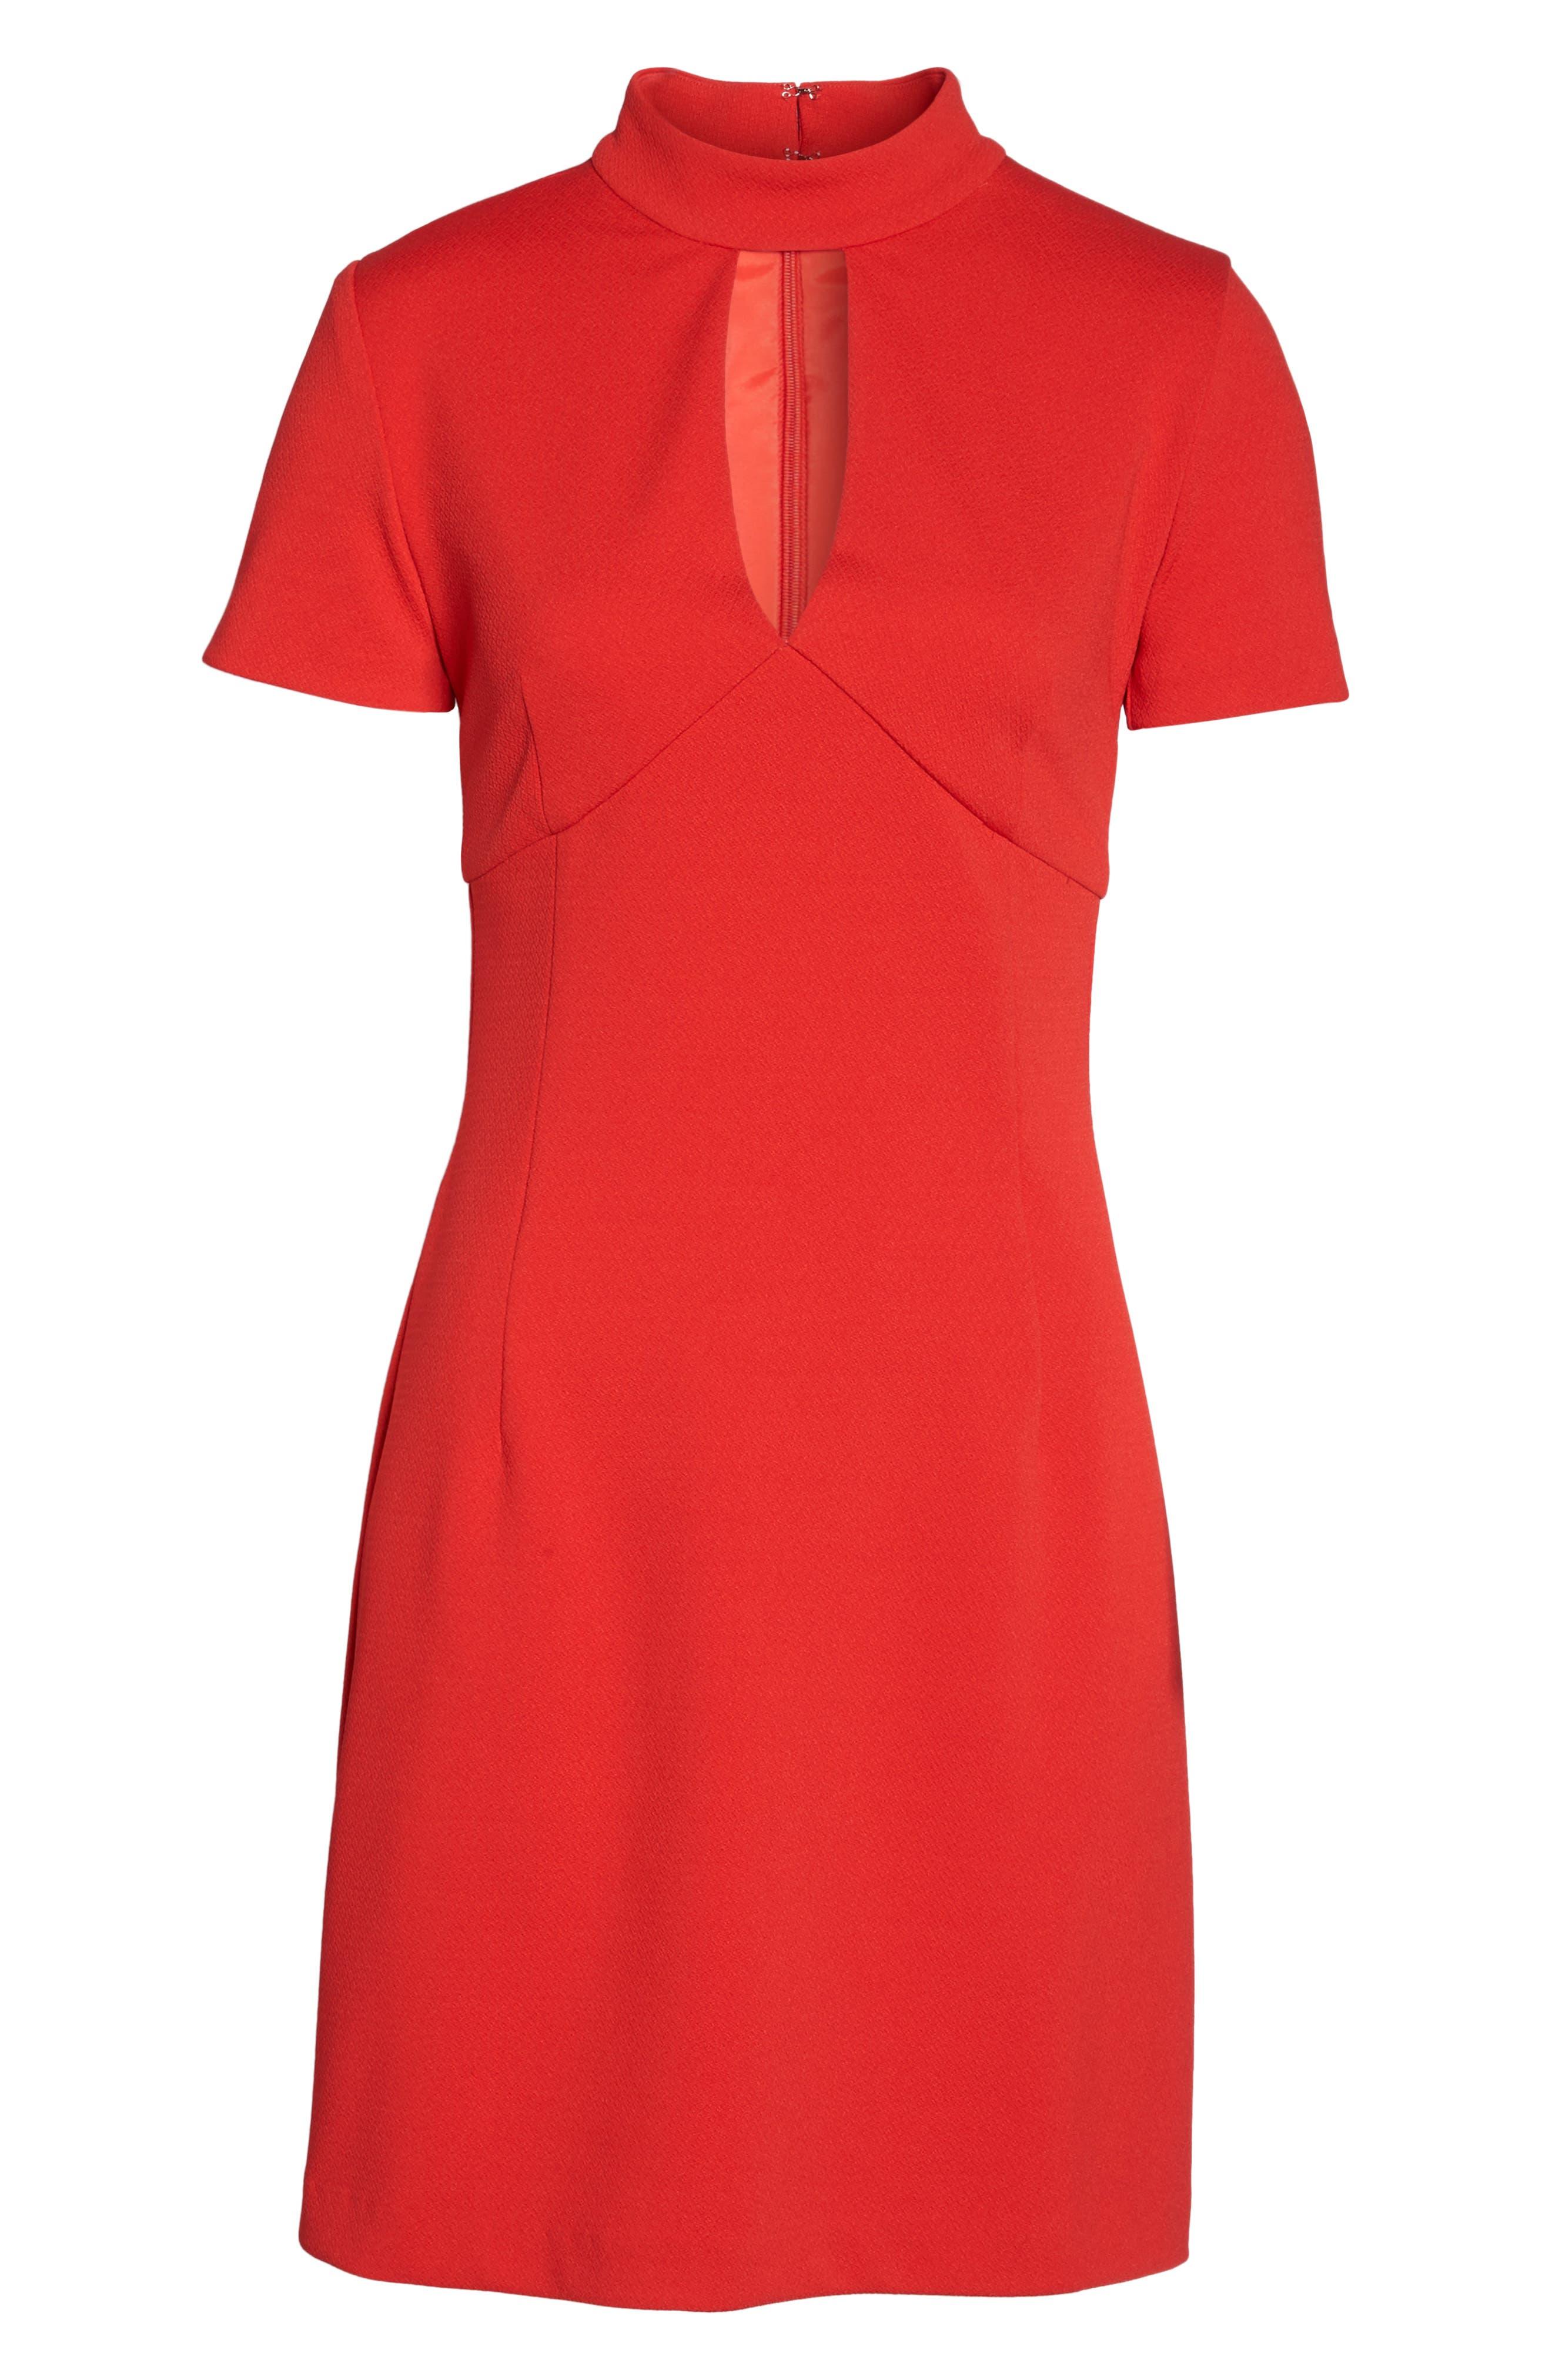 Camari Choker Collar Sheath Dress,                             Alternate thumbnail 6, color,                             Pagoda Red